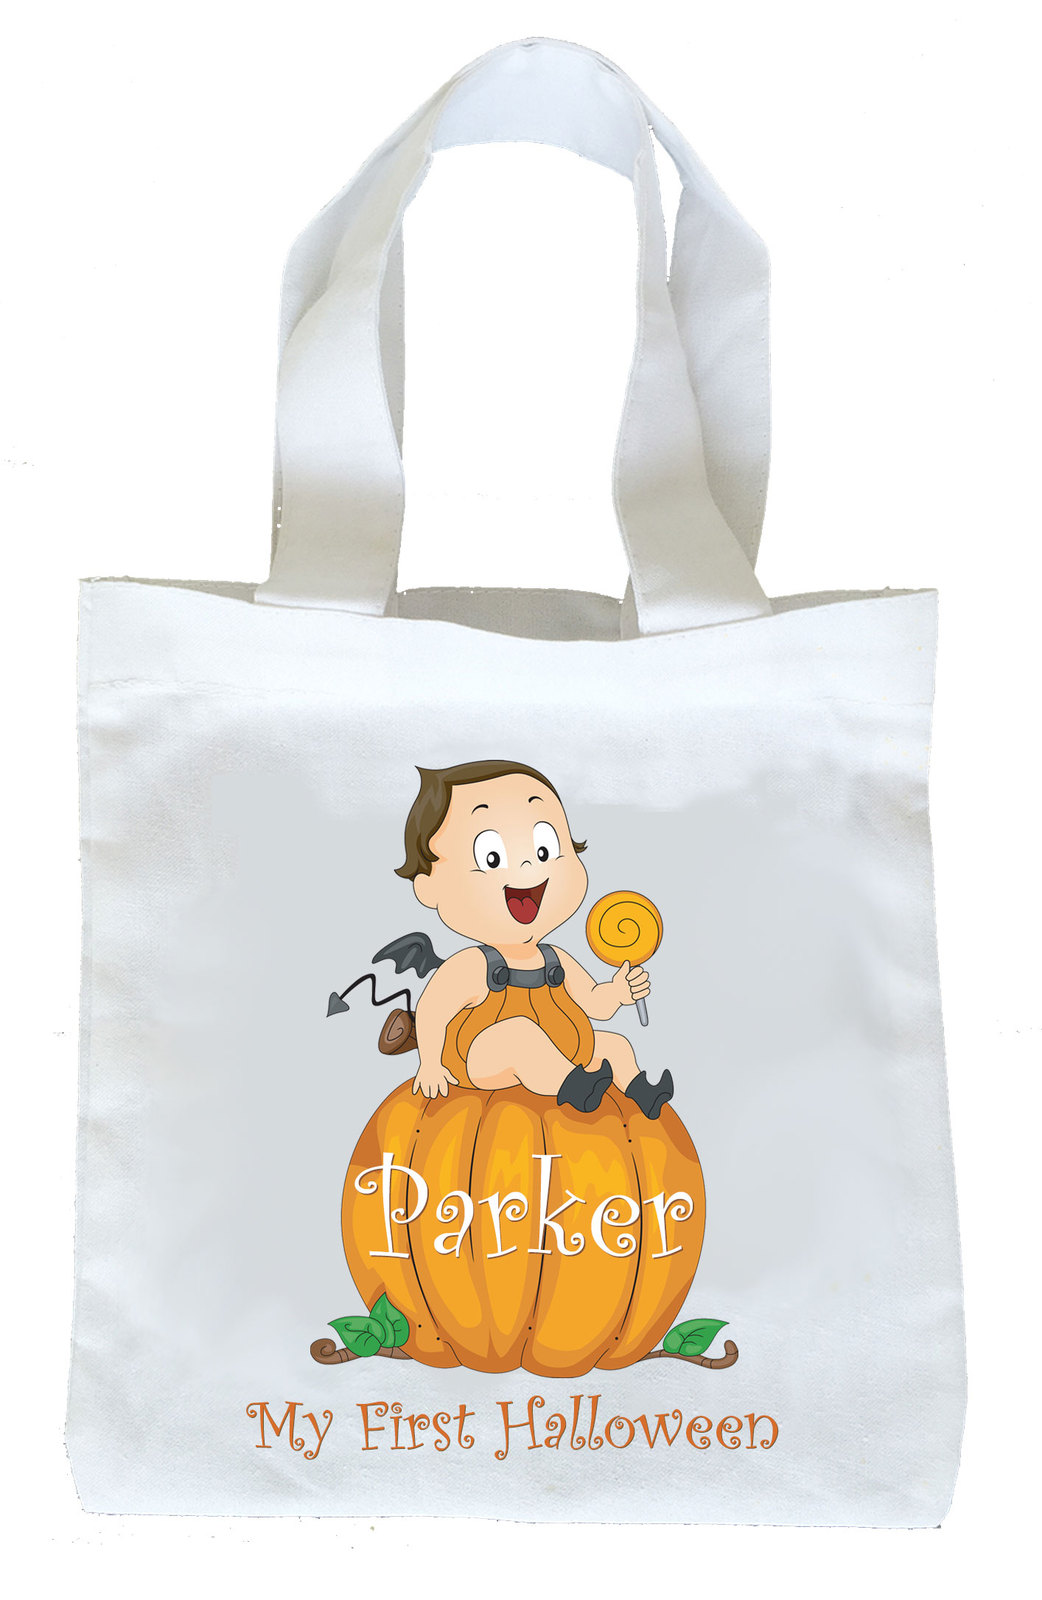 First Halloween Trick or Treat Bag, Boys First Halloween Bag, Boys Candy Bag